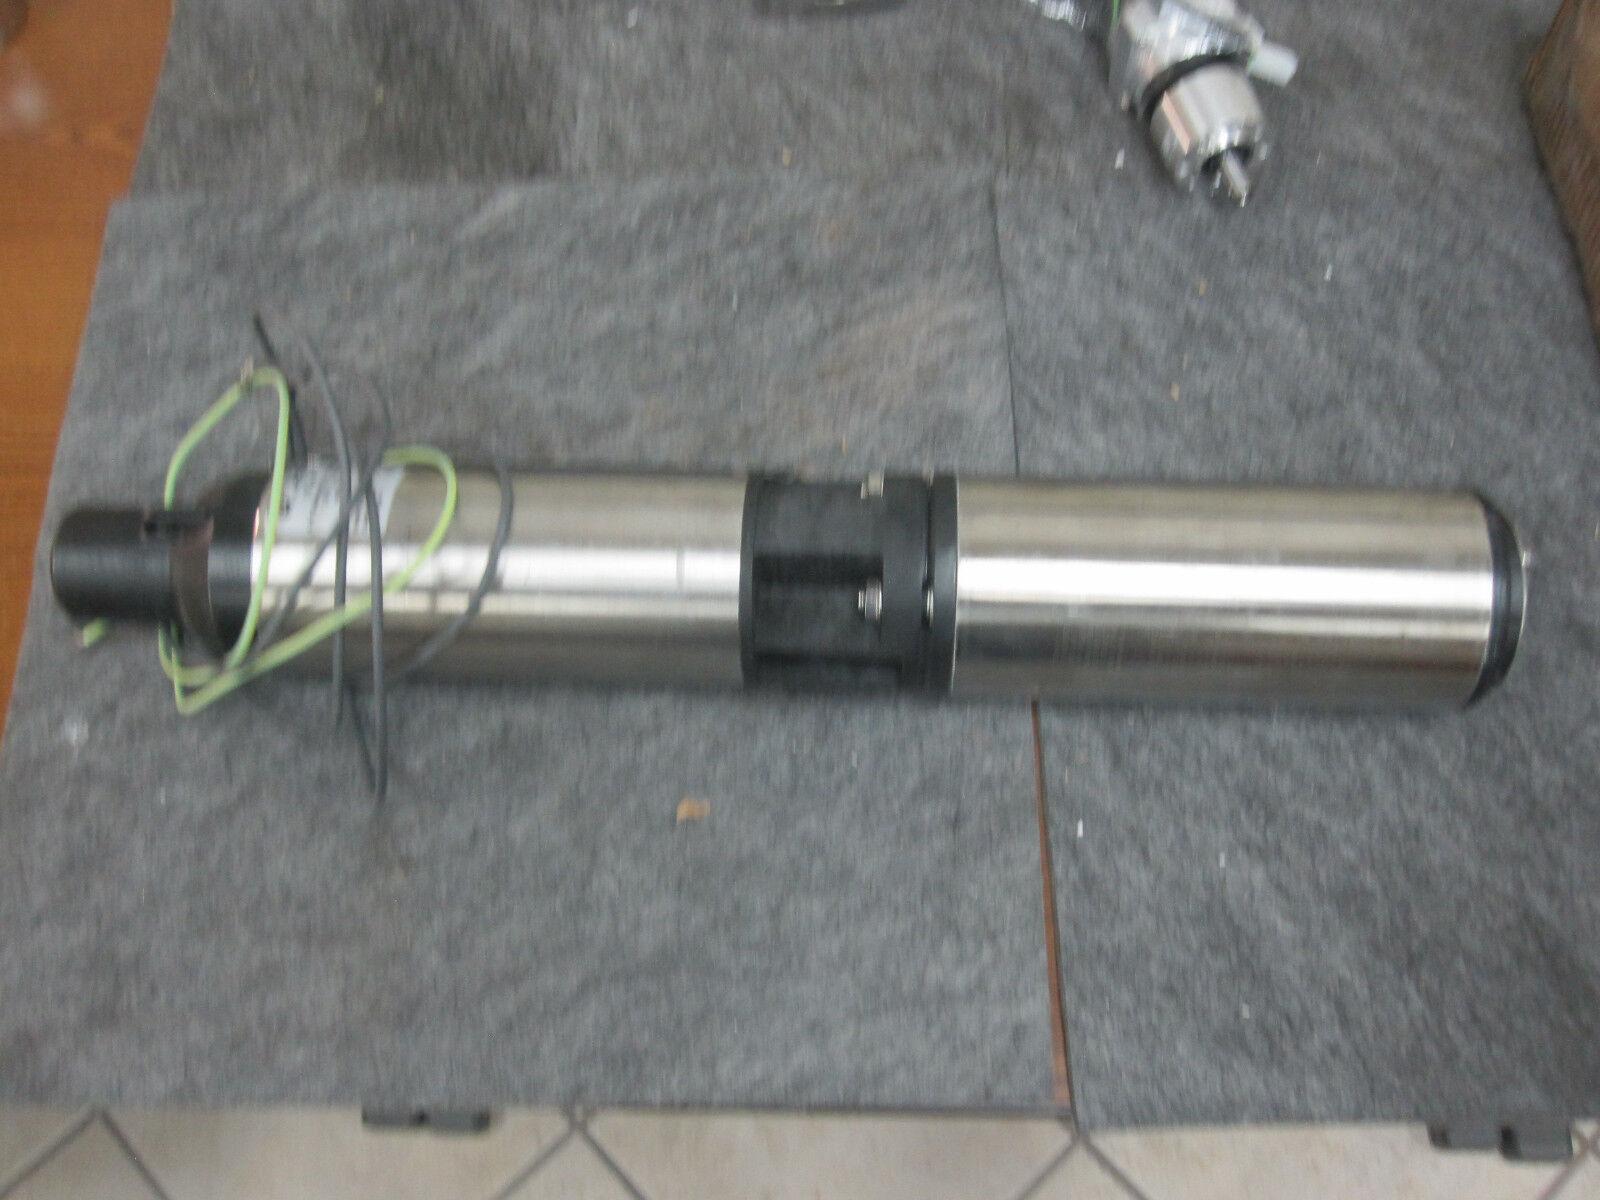 0313837 Utilitech 0.5-HP Edelstahl TauchStiefel Drachenbrunnen Pumpe UT201